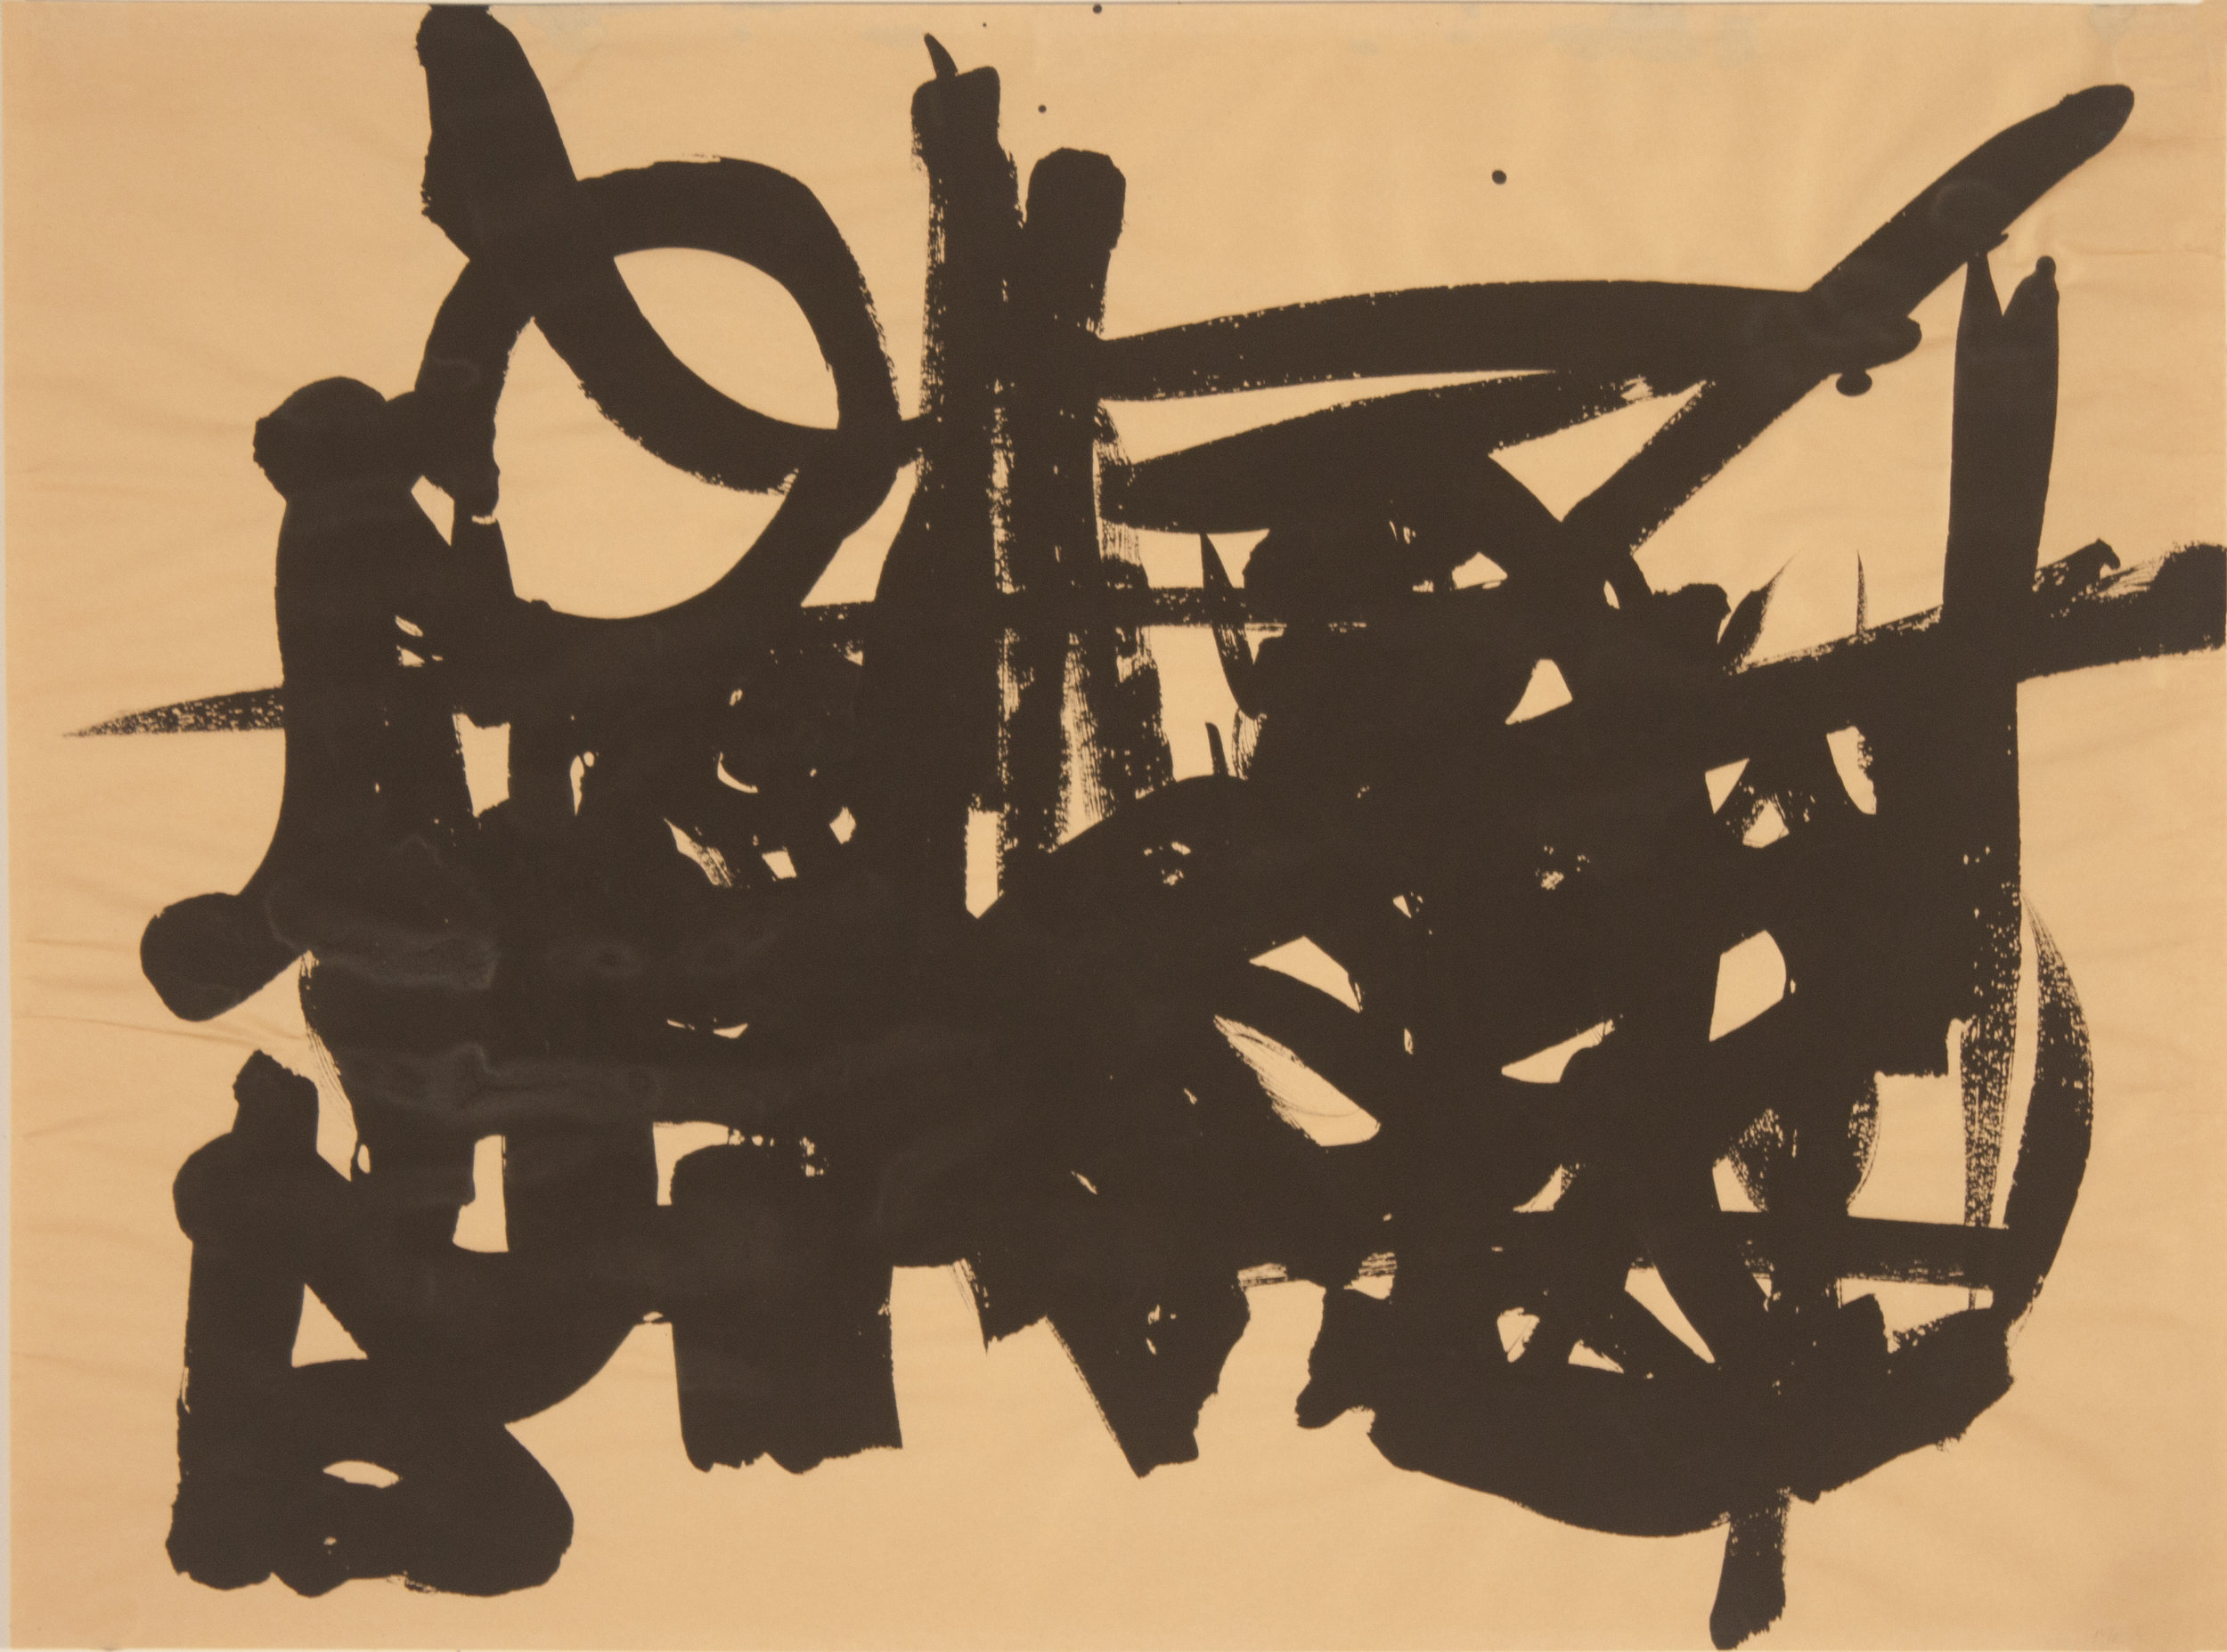 Brush Drawing 7, 1979